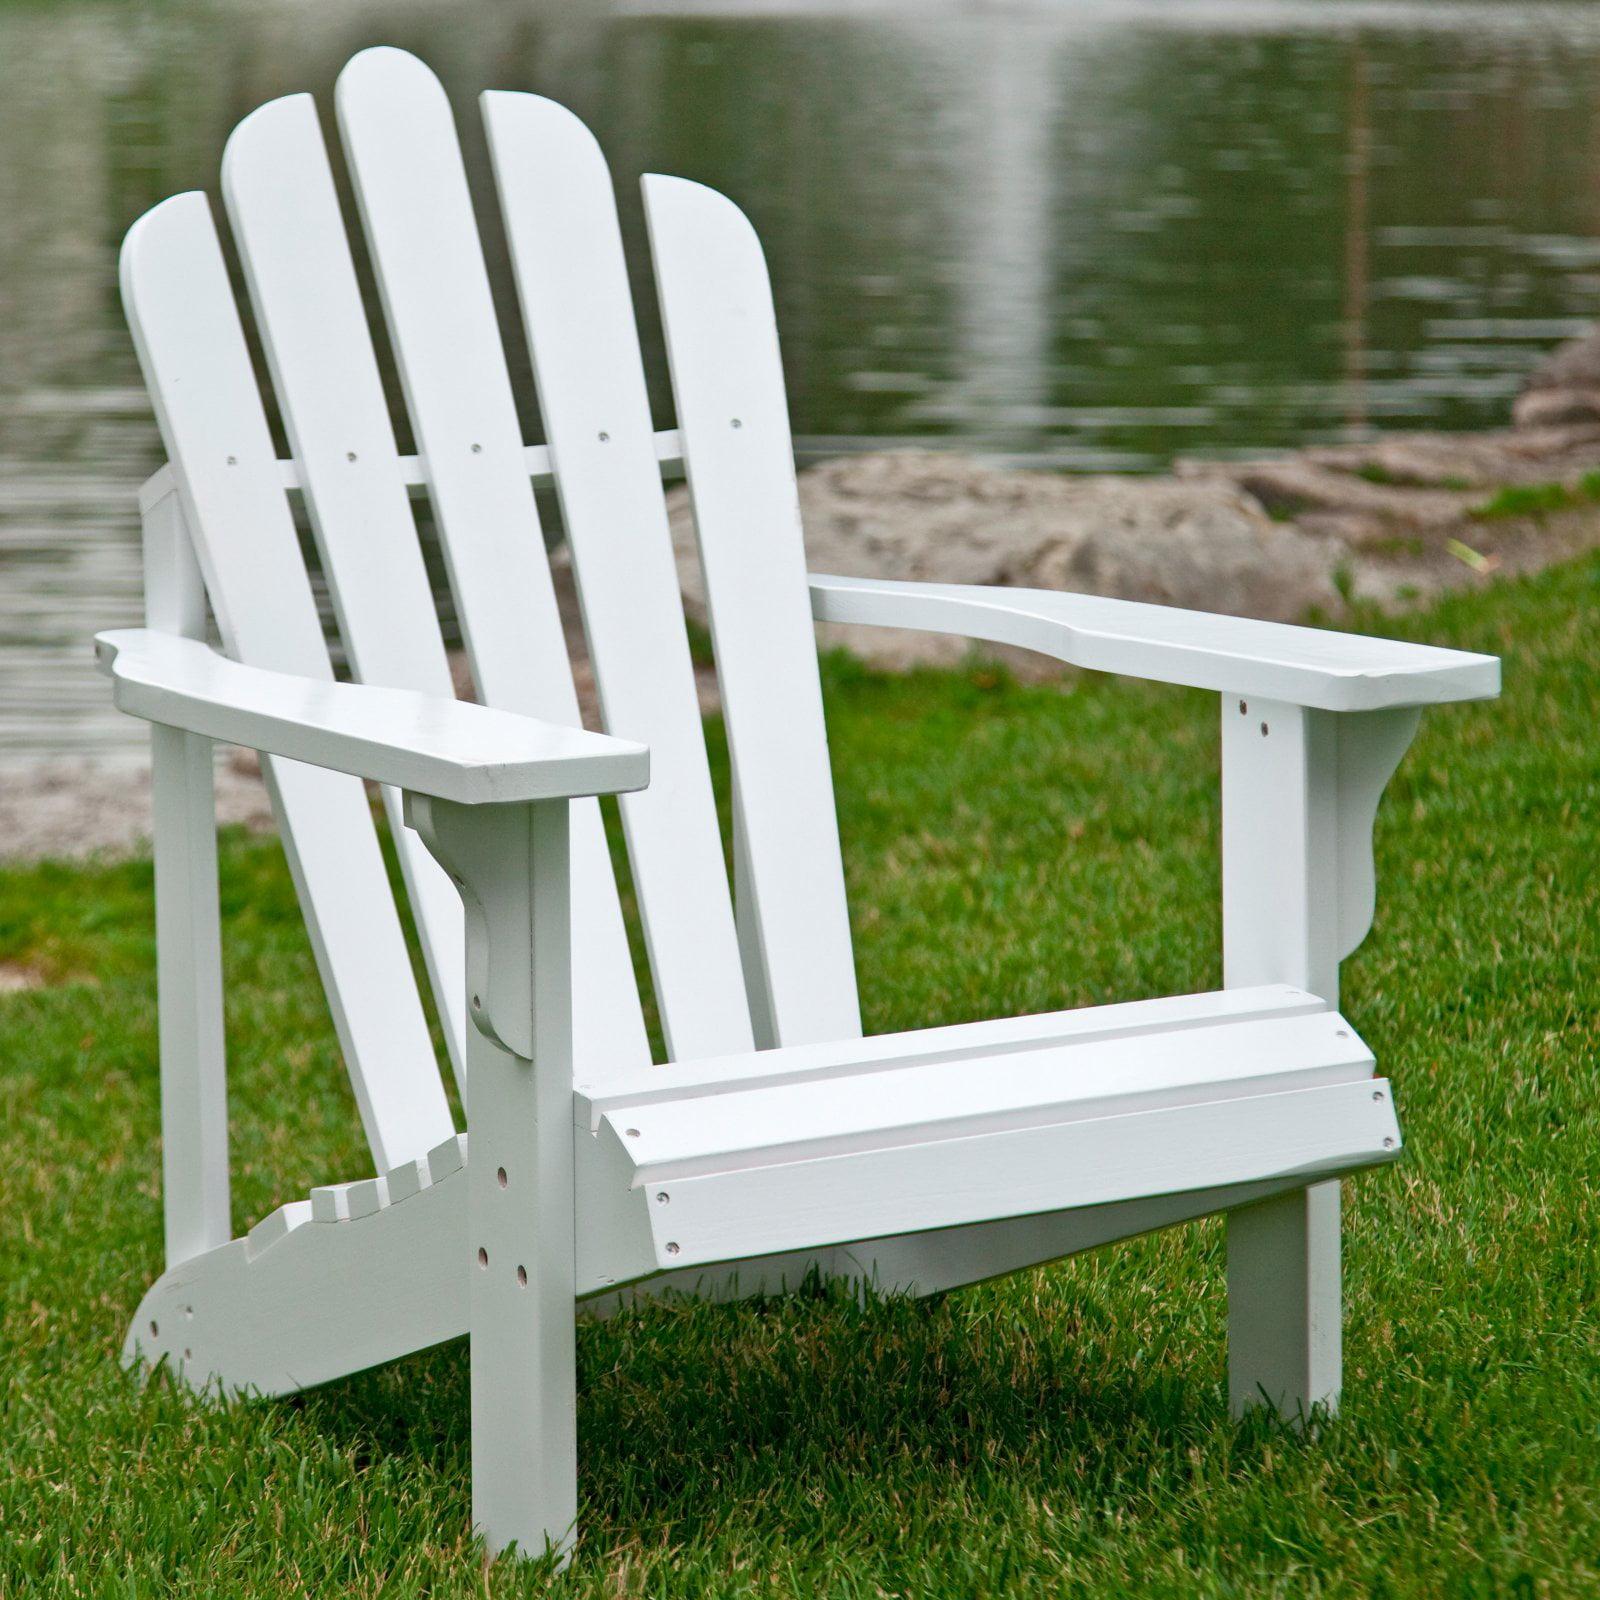 Westport Adirondack Chair, Natural Cedar Wood White by Shine Company